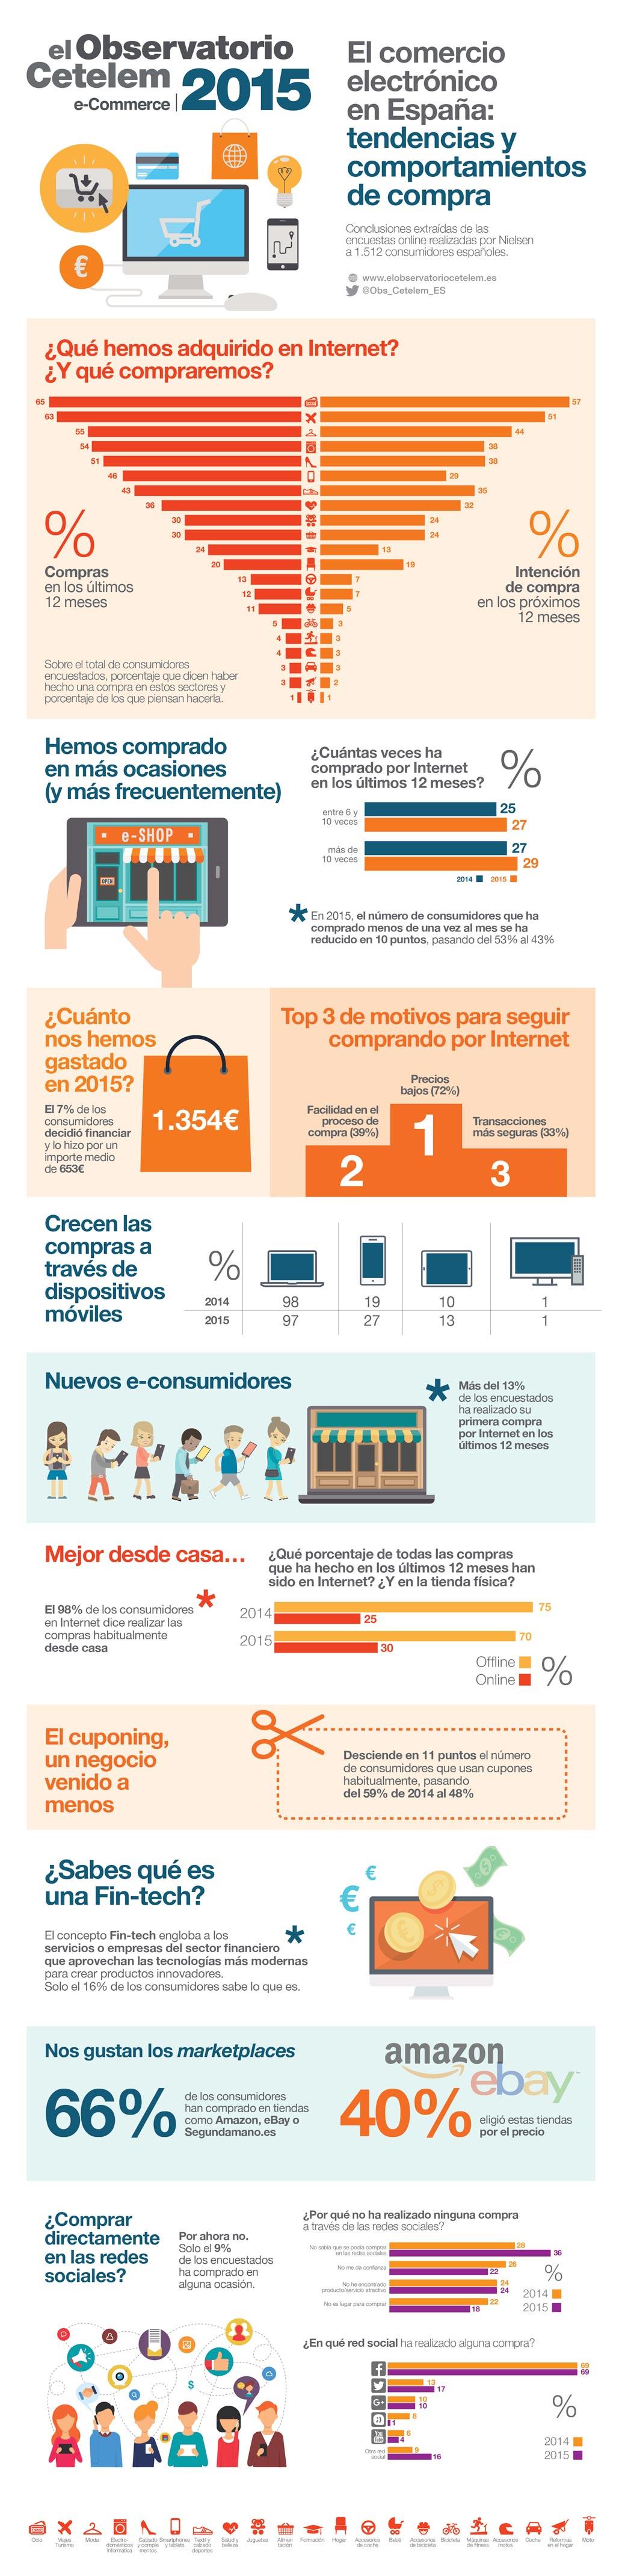 Infografía Informe Ecommerce Cetelem 2015